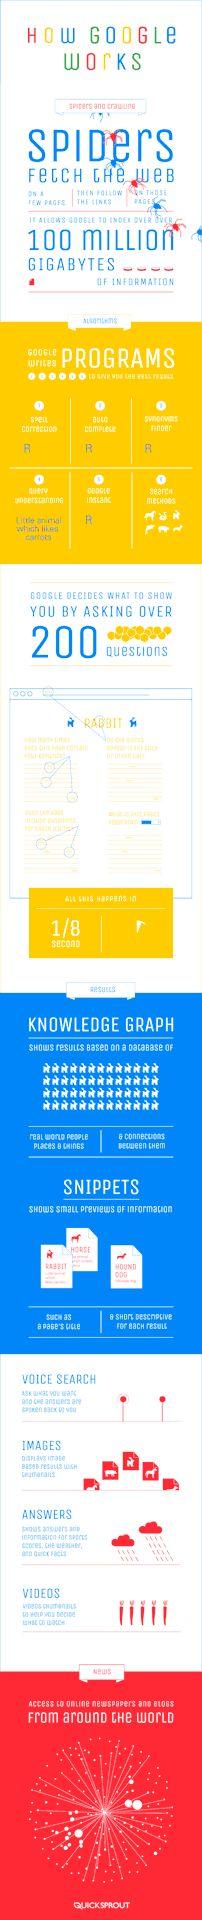 Background image SEO Marketing Services, Website Designing & Hosting Services